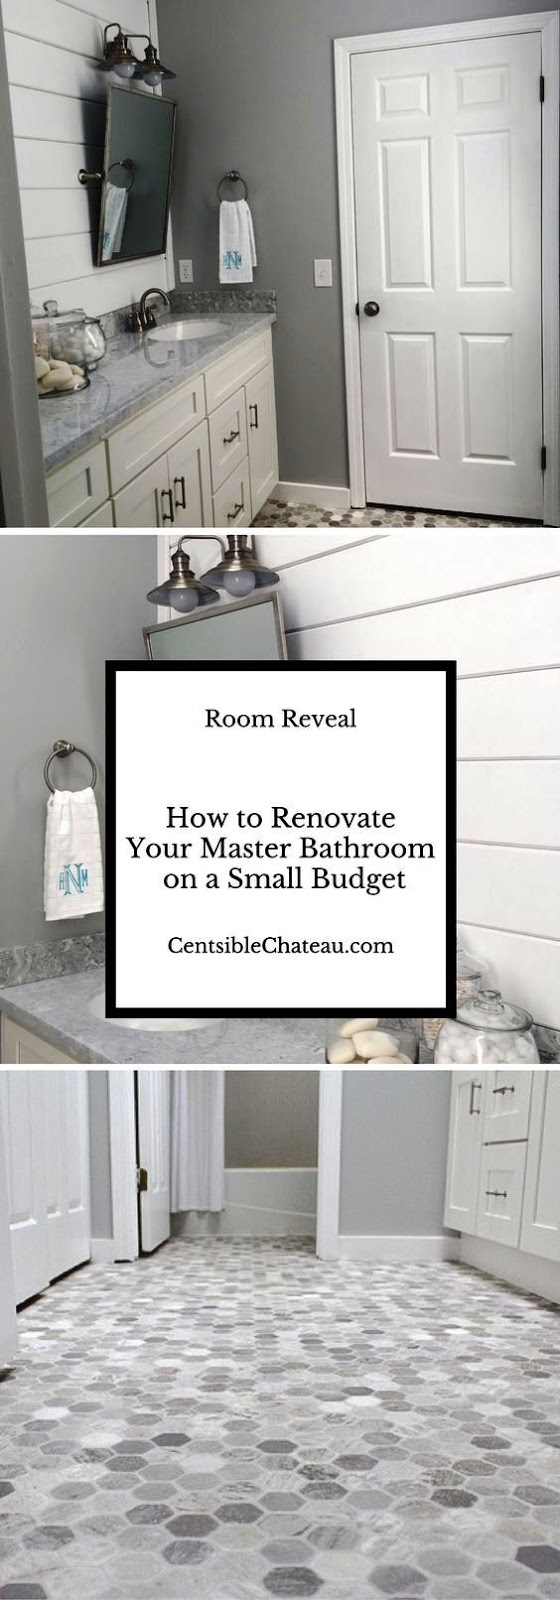 Bathroom Remodeling Ideas On A Budget - Decor Units